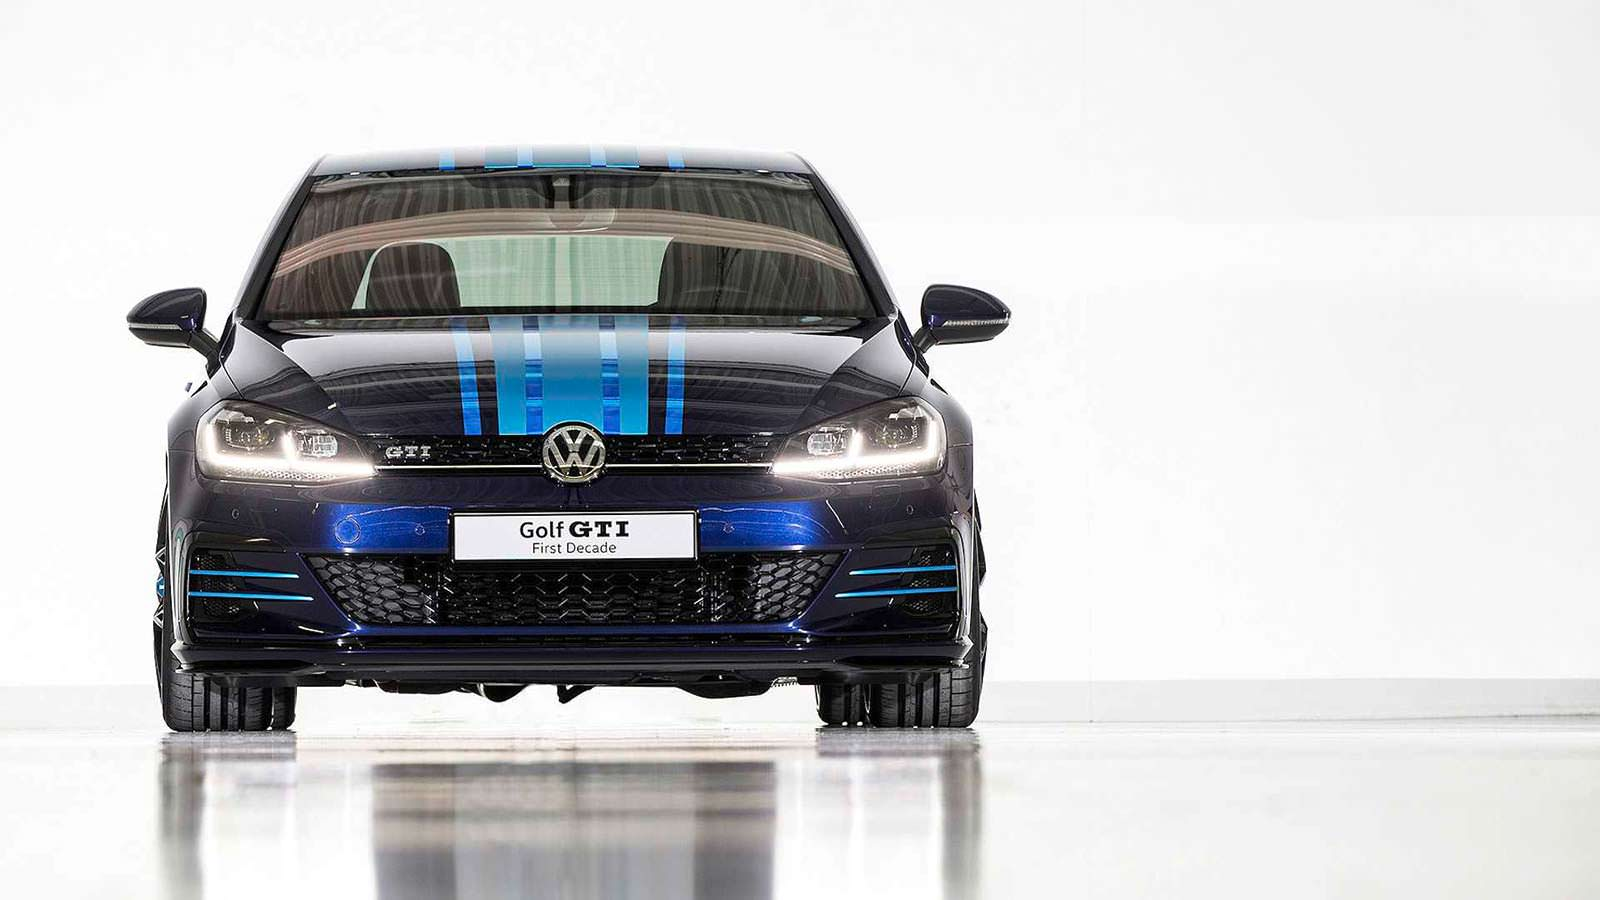 Фото | Хэтчбек Volkswagen Golf GTI First Decade 2017 года